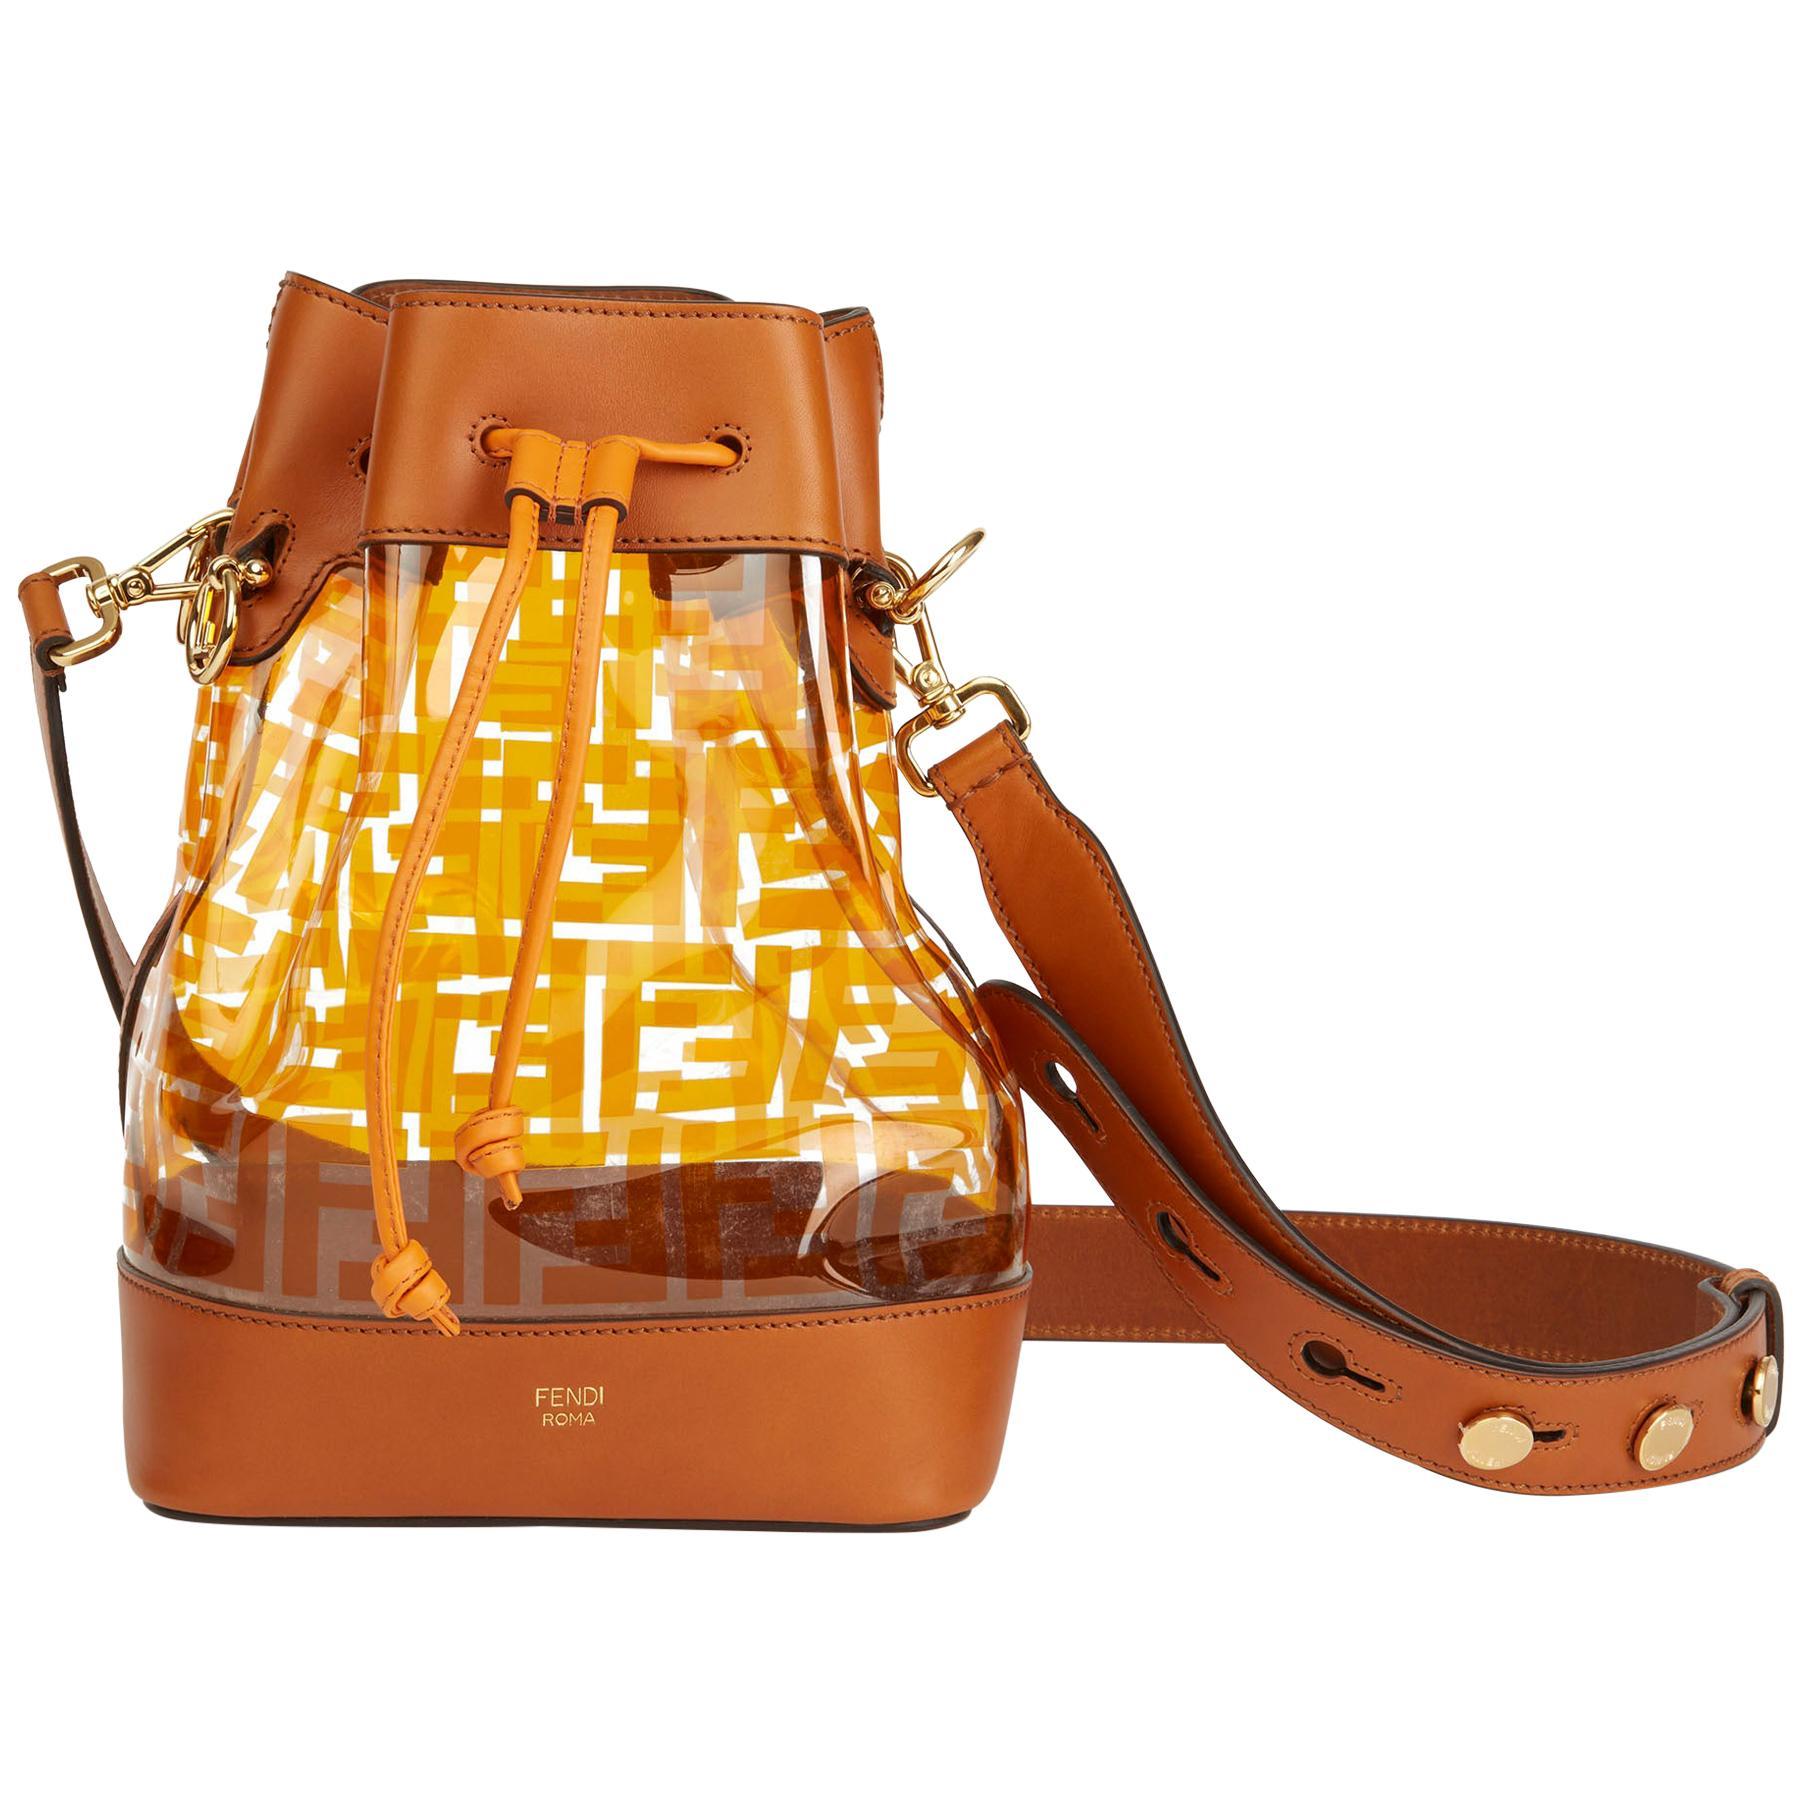 2019 Fendi Brown Calfskin Leather & Monogram PVC Mon Tresor Bucket Bag